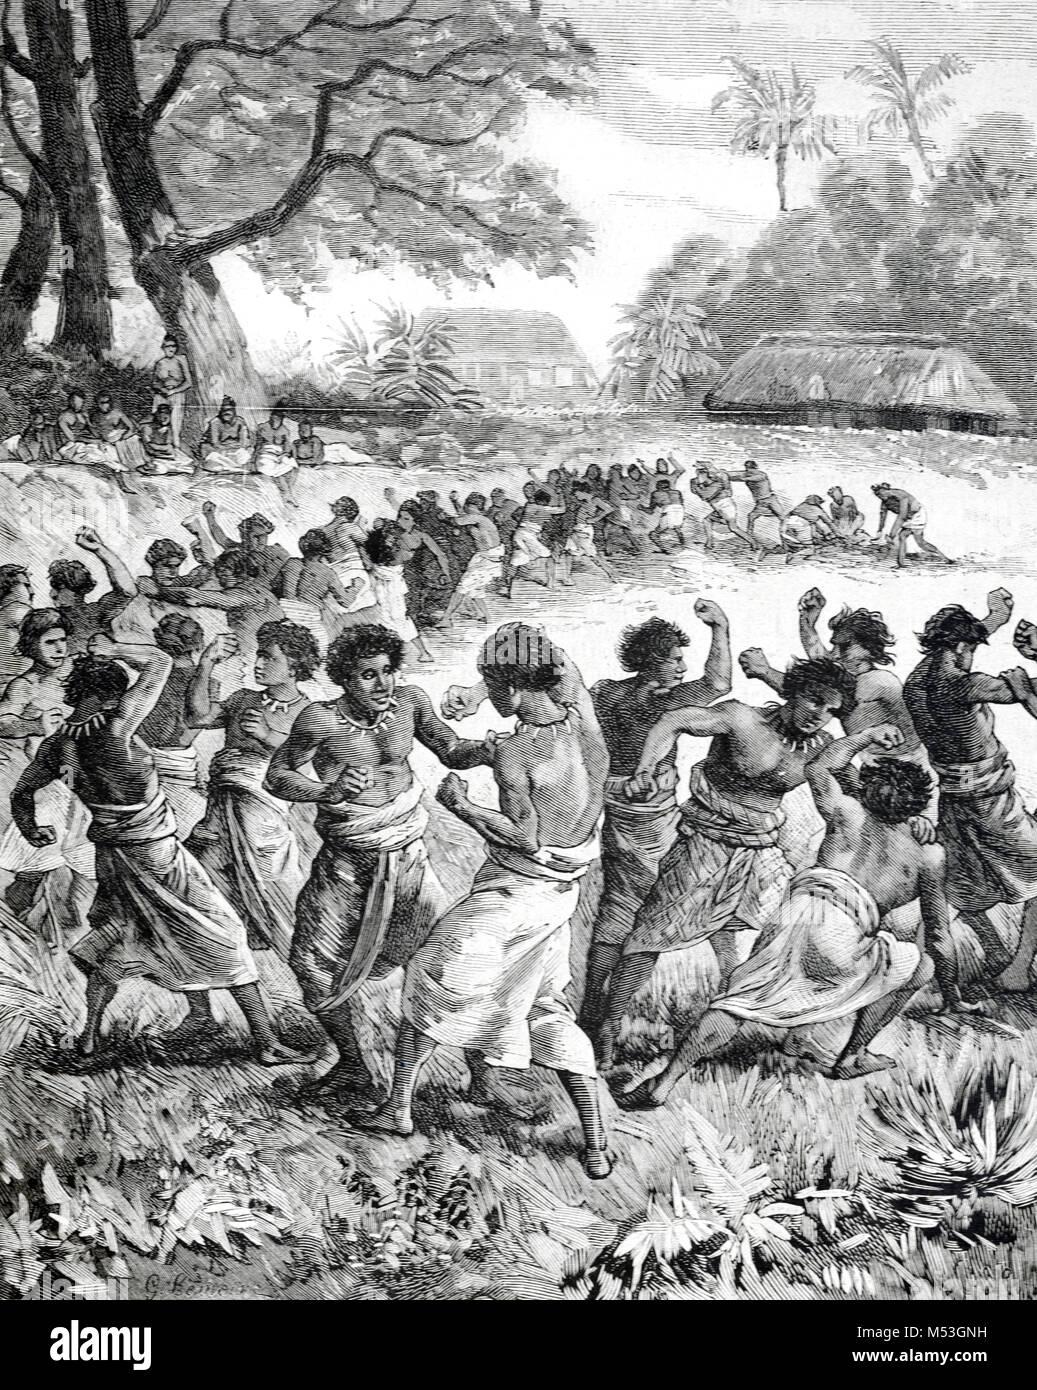 Tongan Men Boxing in Tonga, or the Kingdom of Tonga, Polynesia (Engraving, 1988) - Stock Image